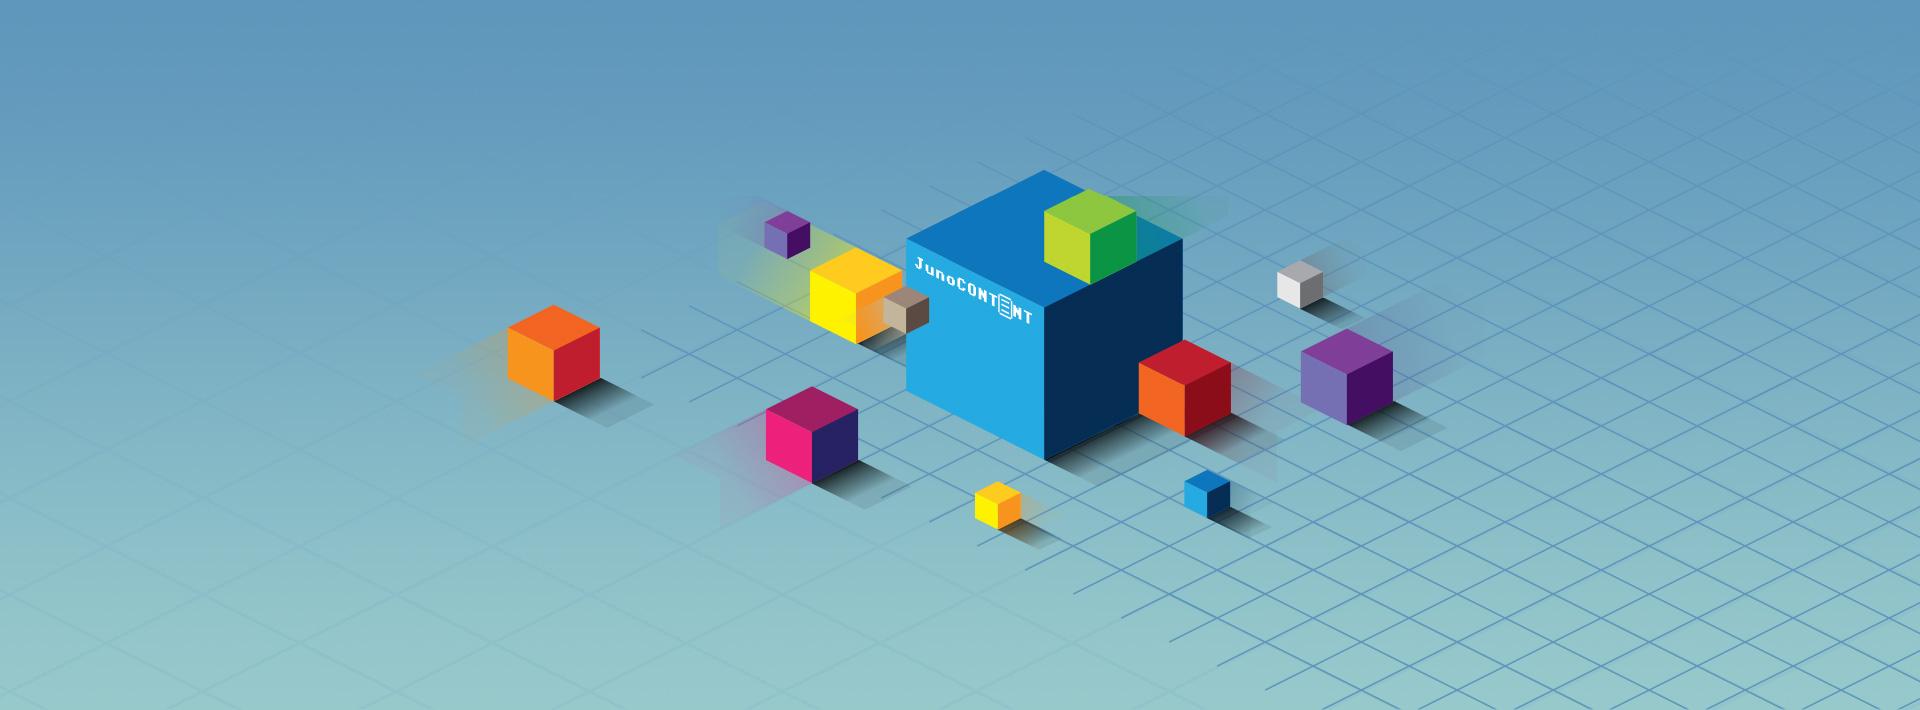 JunoContent is a distinguished European content management specialist